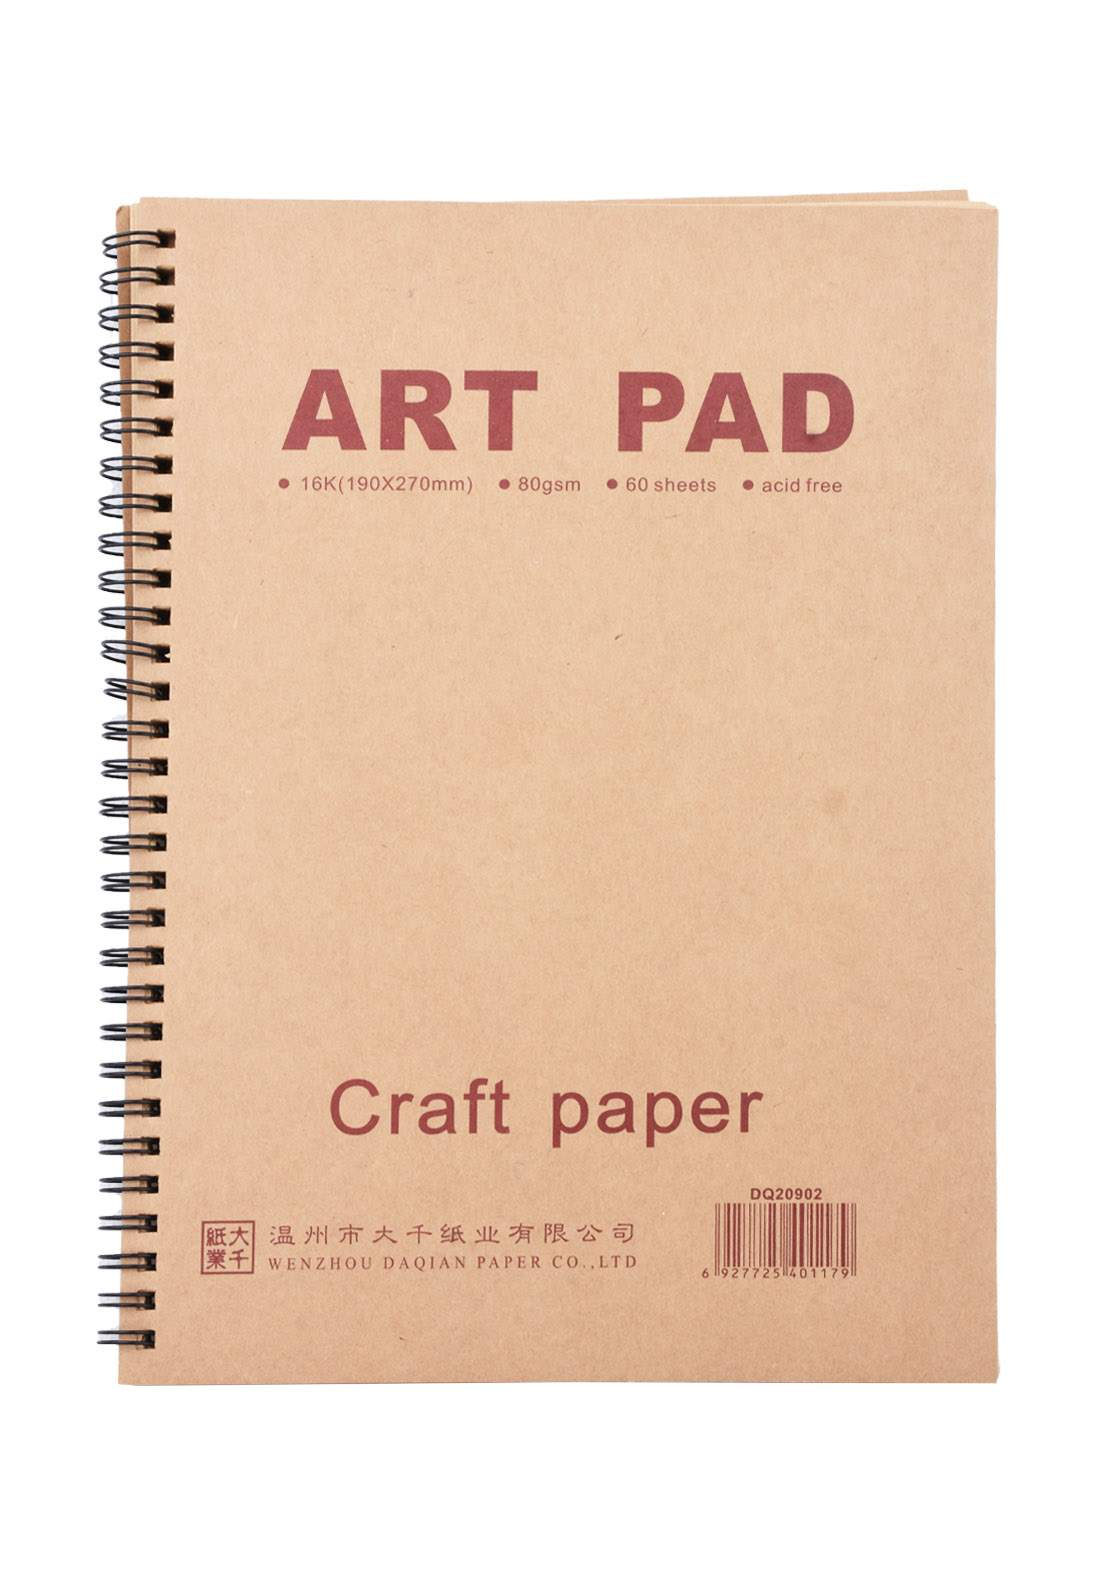 Art Pad Craft paper 60 Sheets(PAD20902)دفتر ملاحظات سيم 60 ورقة